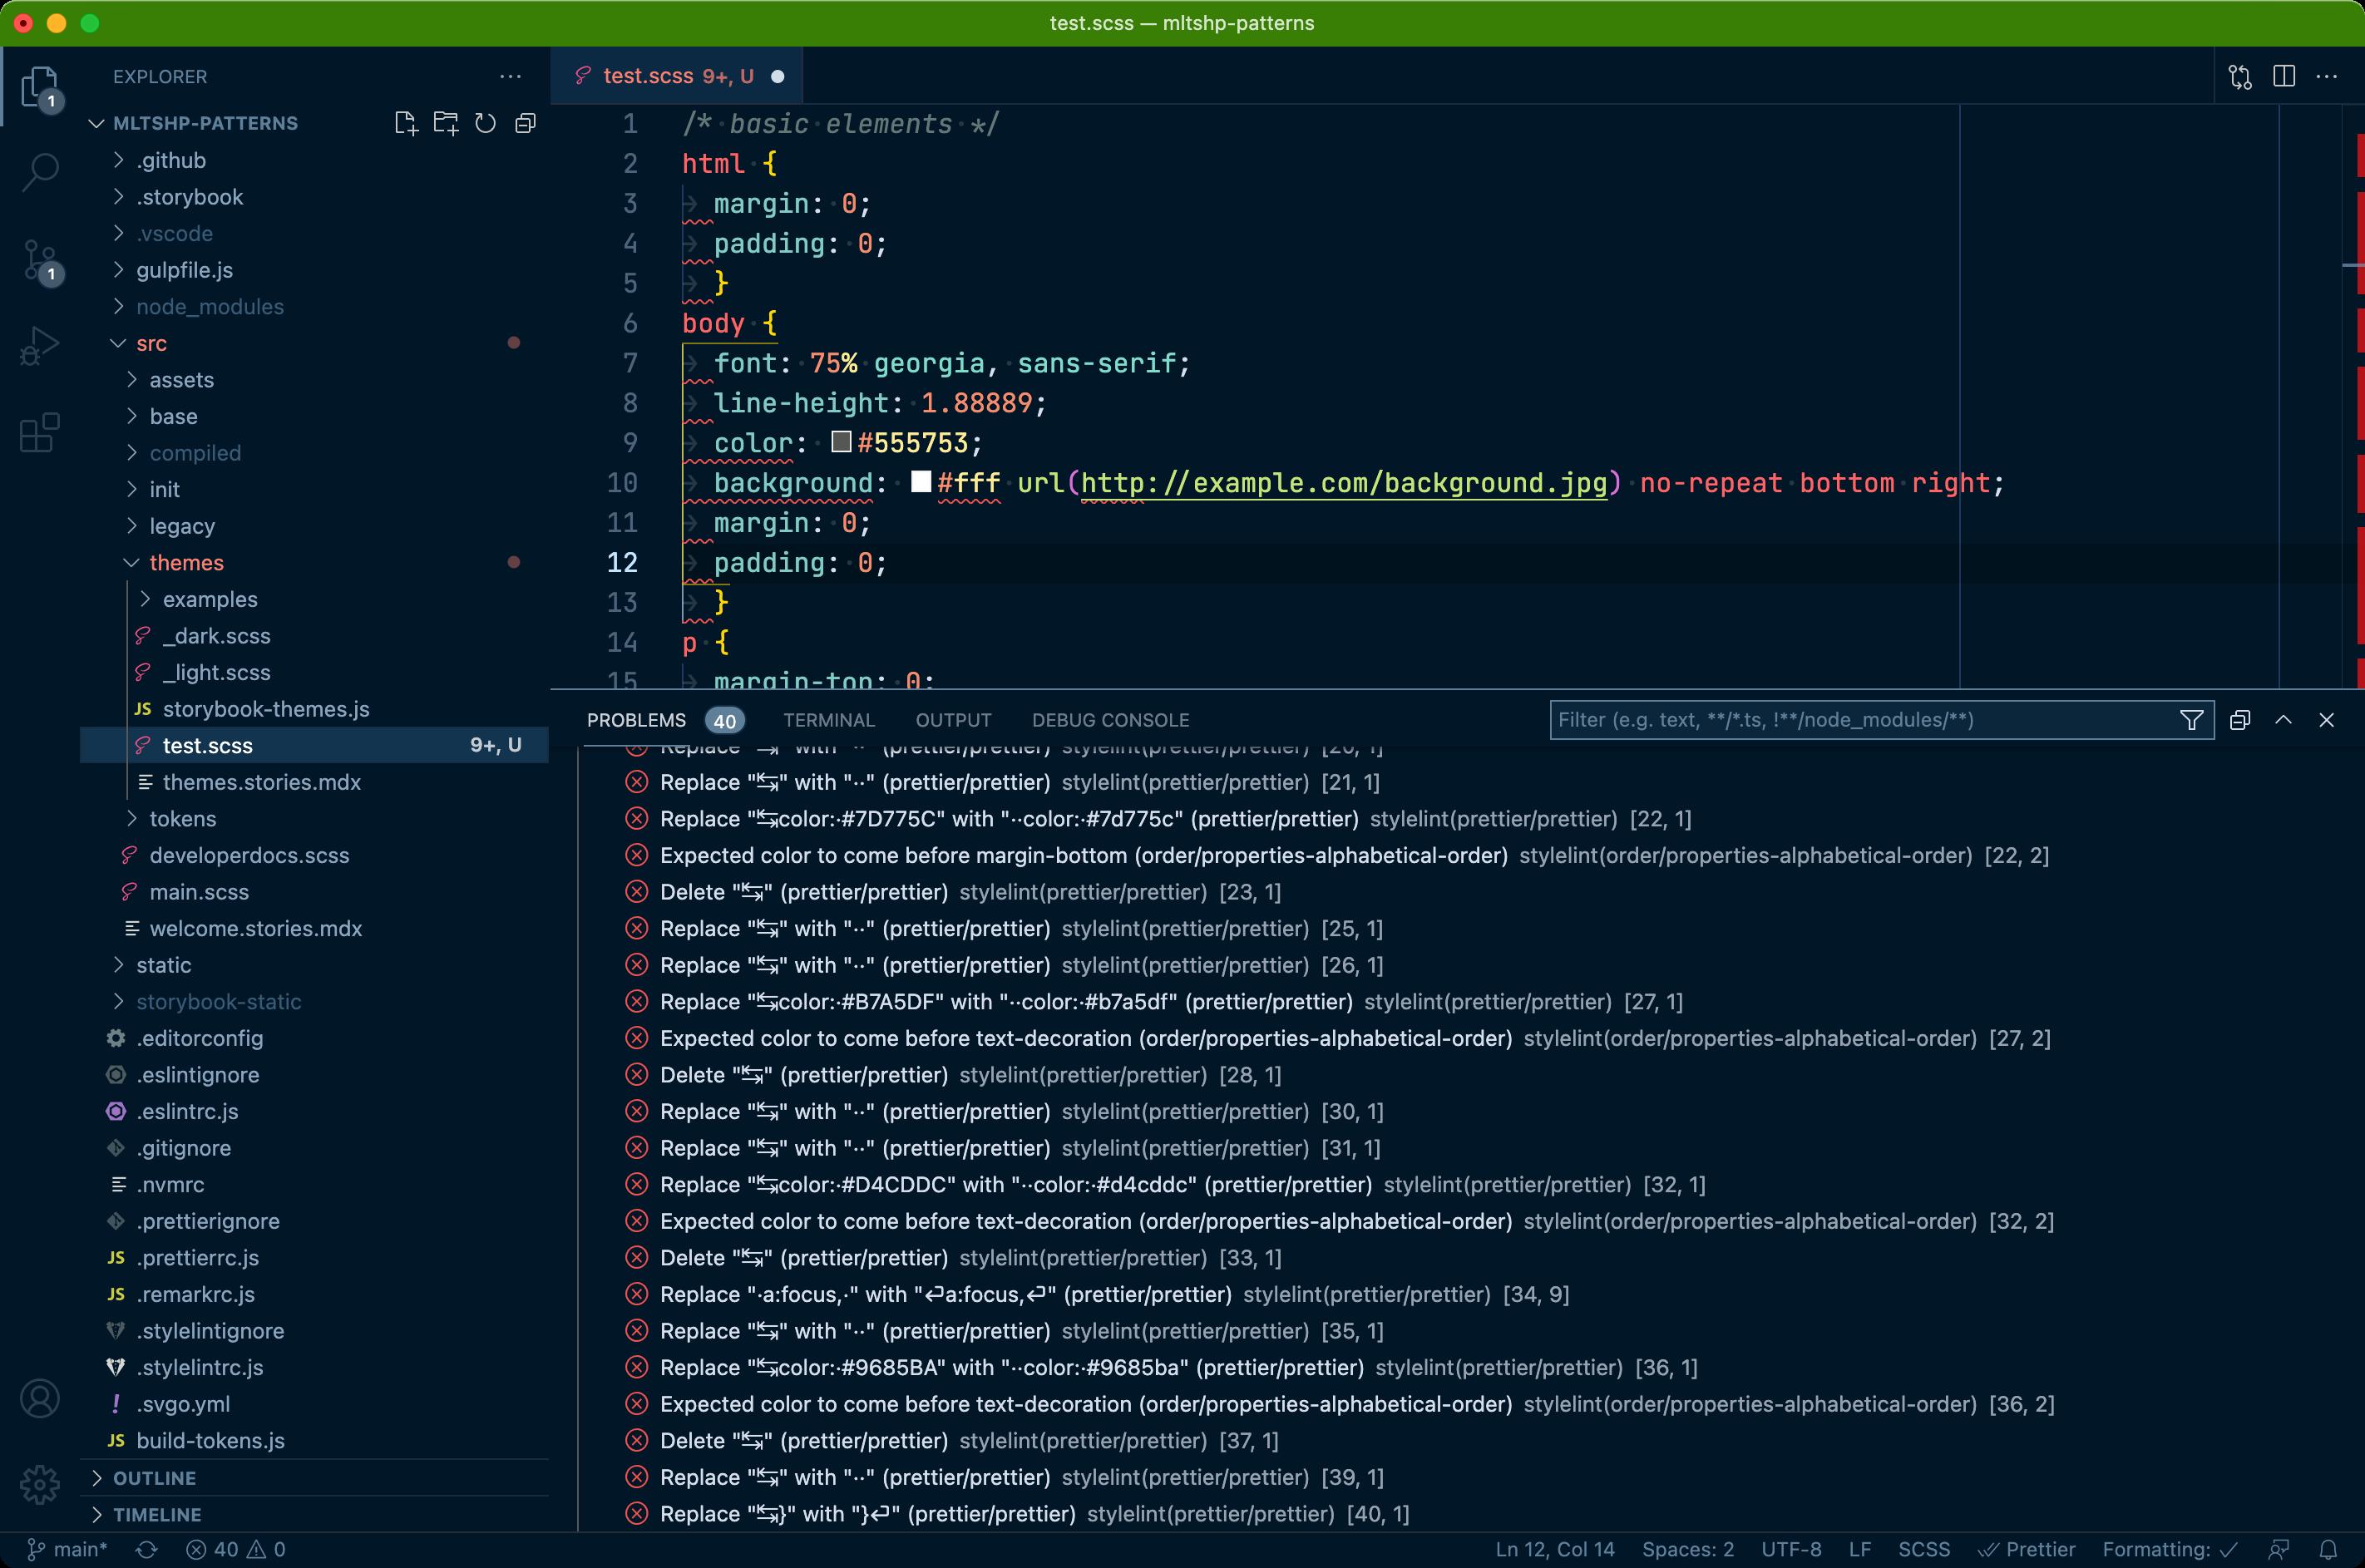 Screenshot of a code editor showing lint errors.